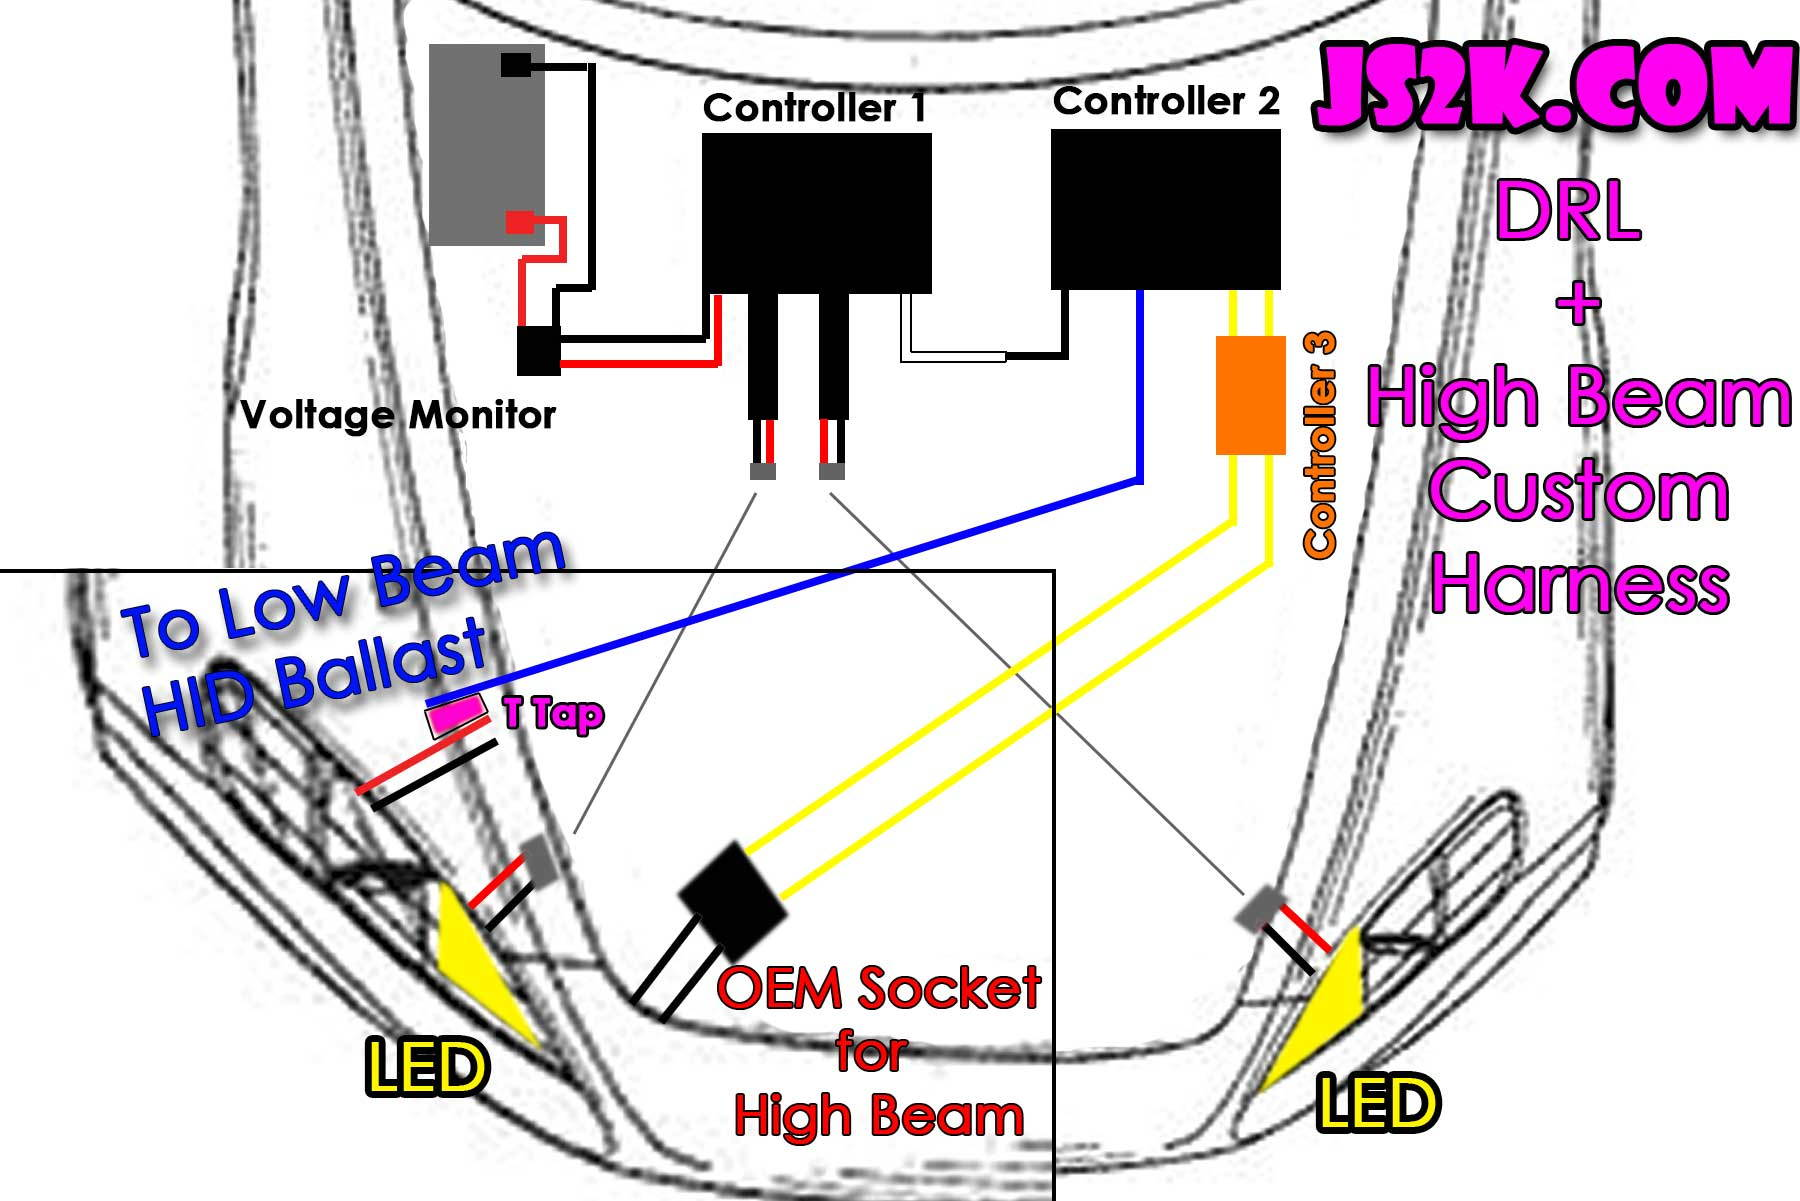 JS2k LED DRL + High Beams Solution Inside Factory Headlights